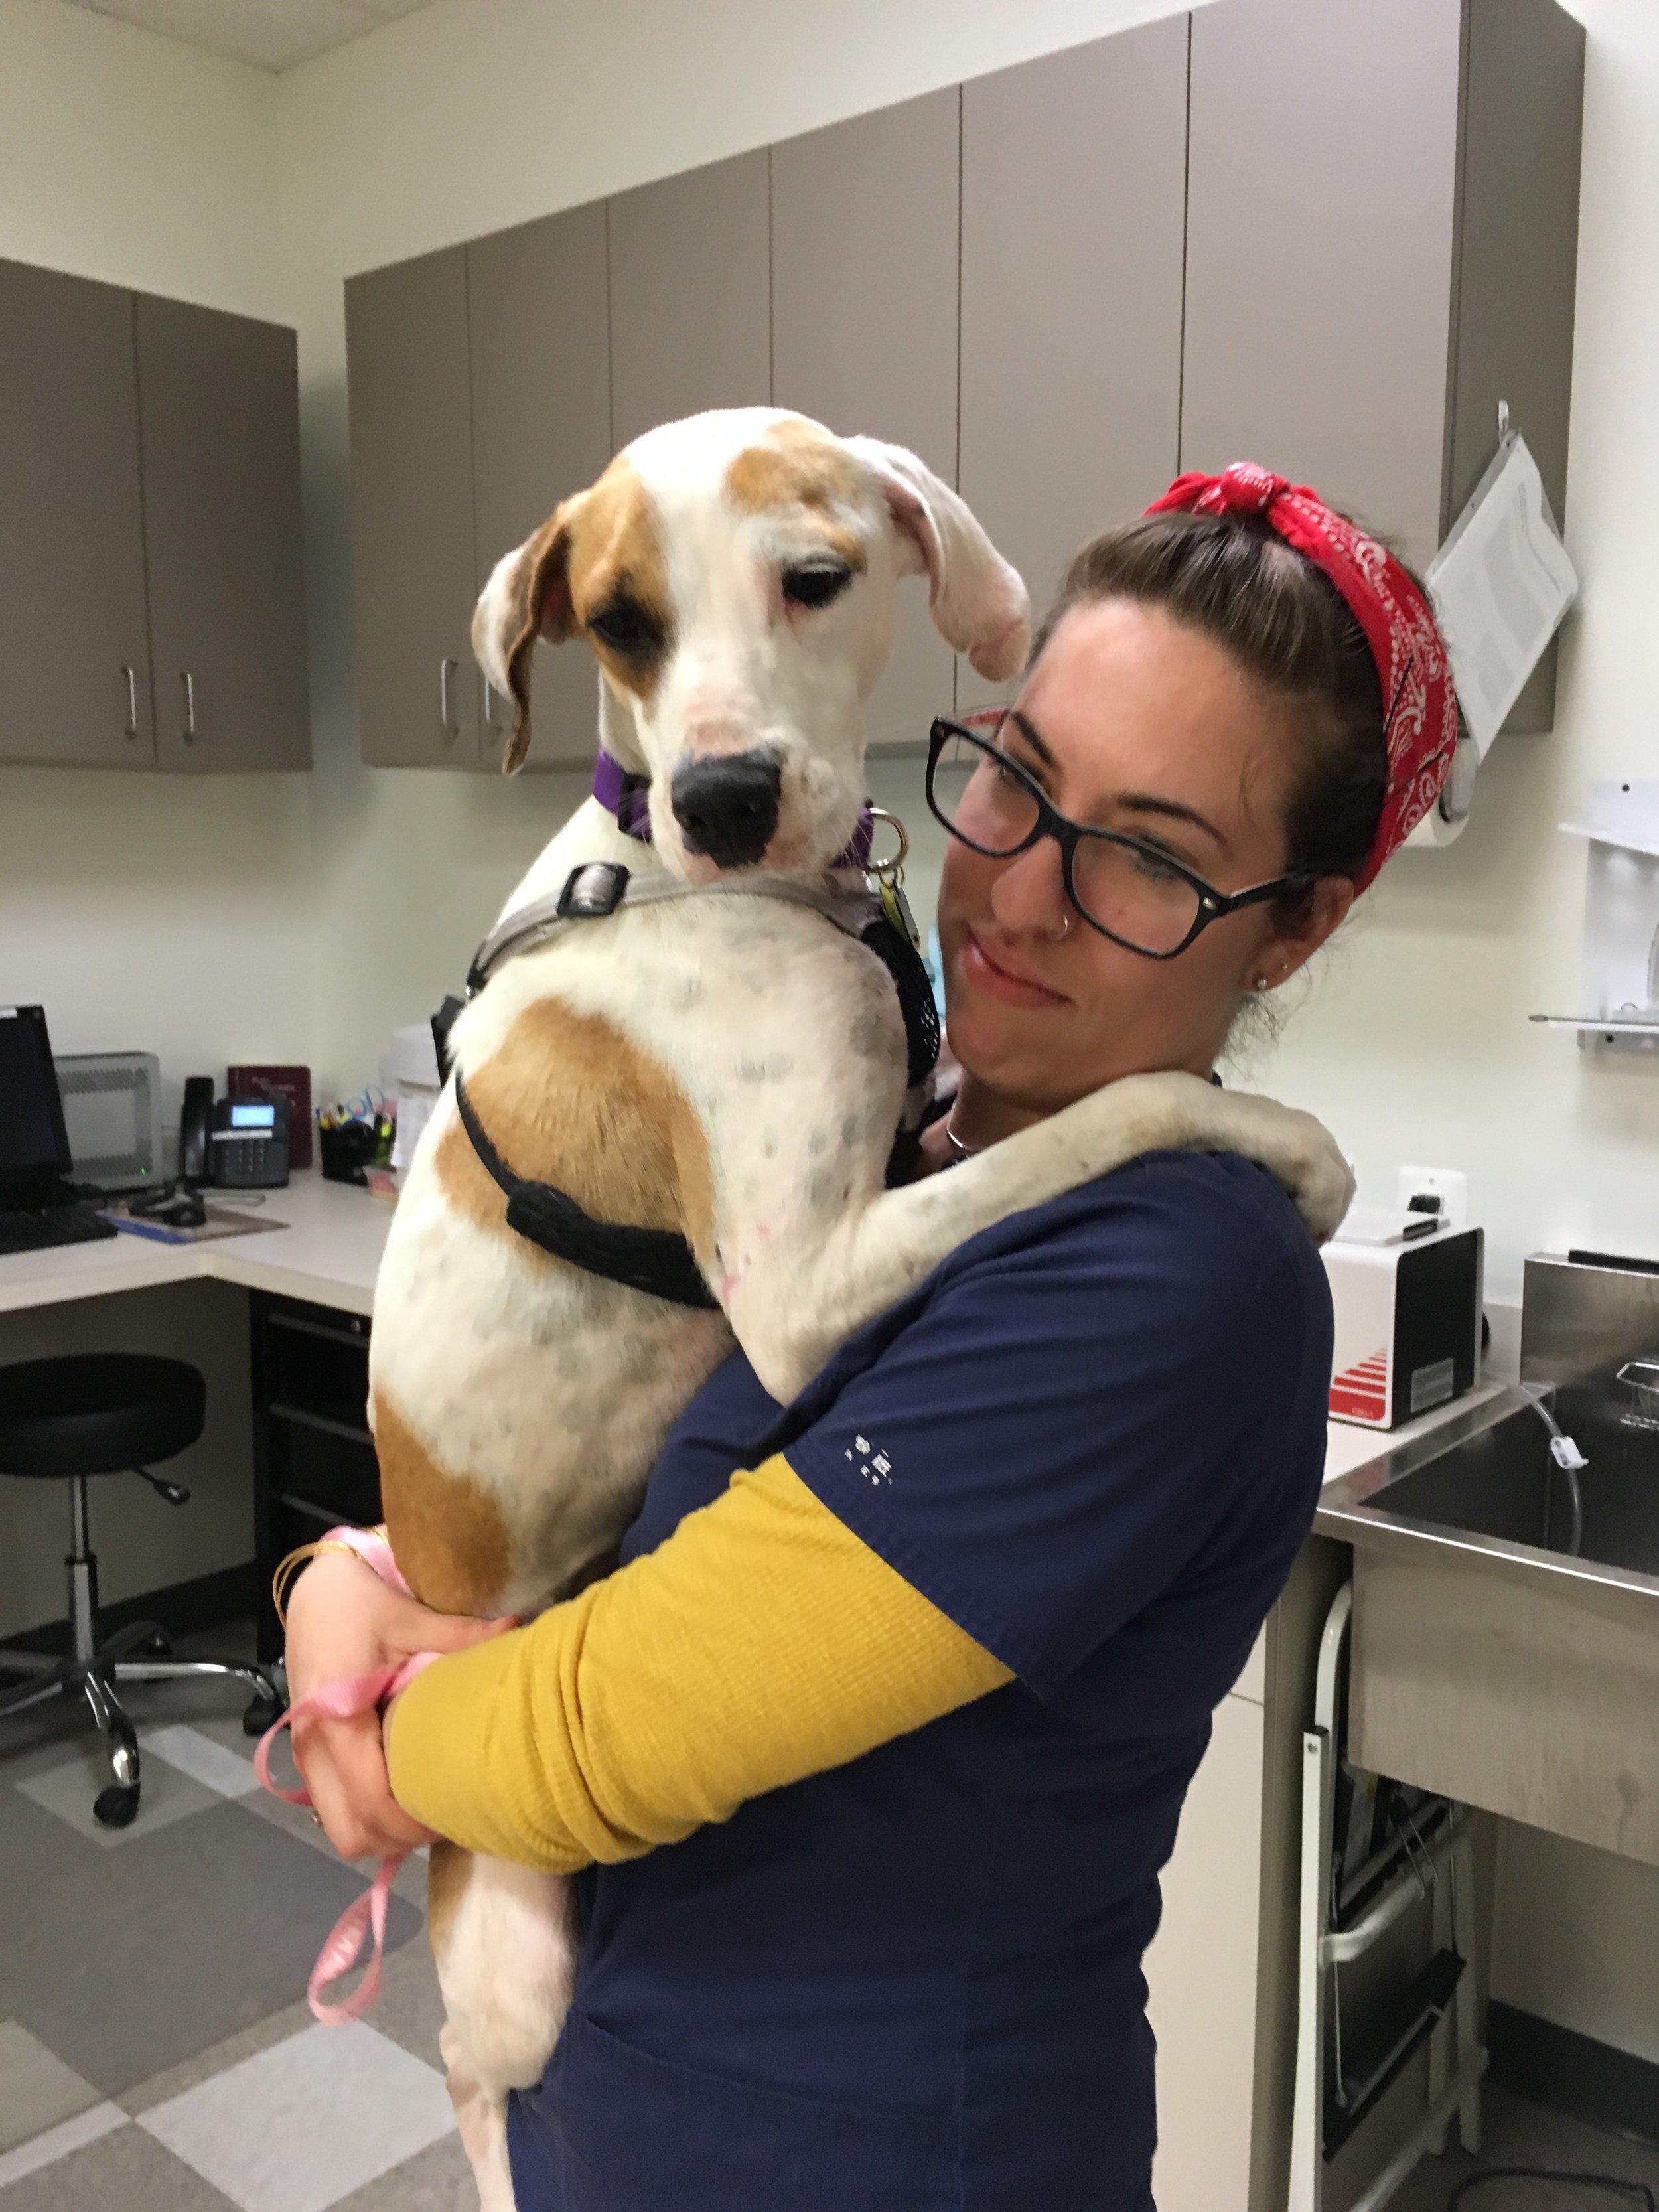 Clarendon Animal Care Veterinary Clinic Arlington Virginia technician holding a dog